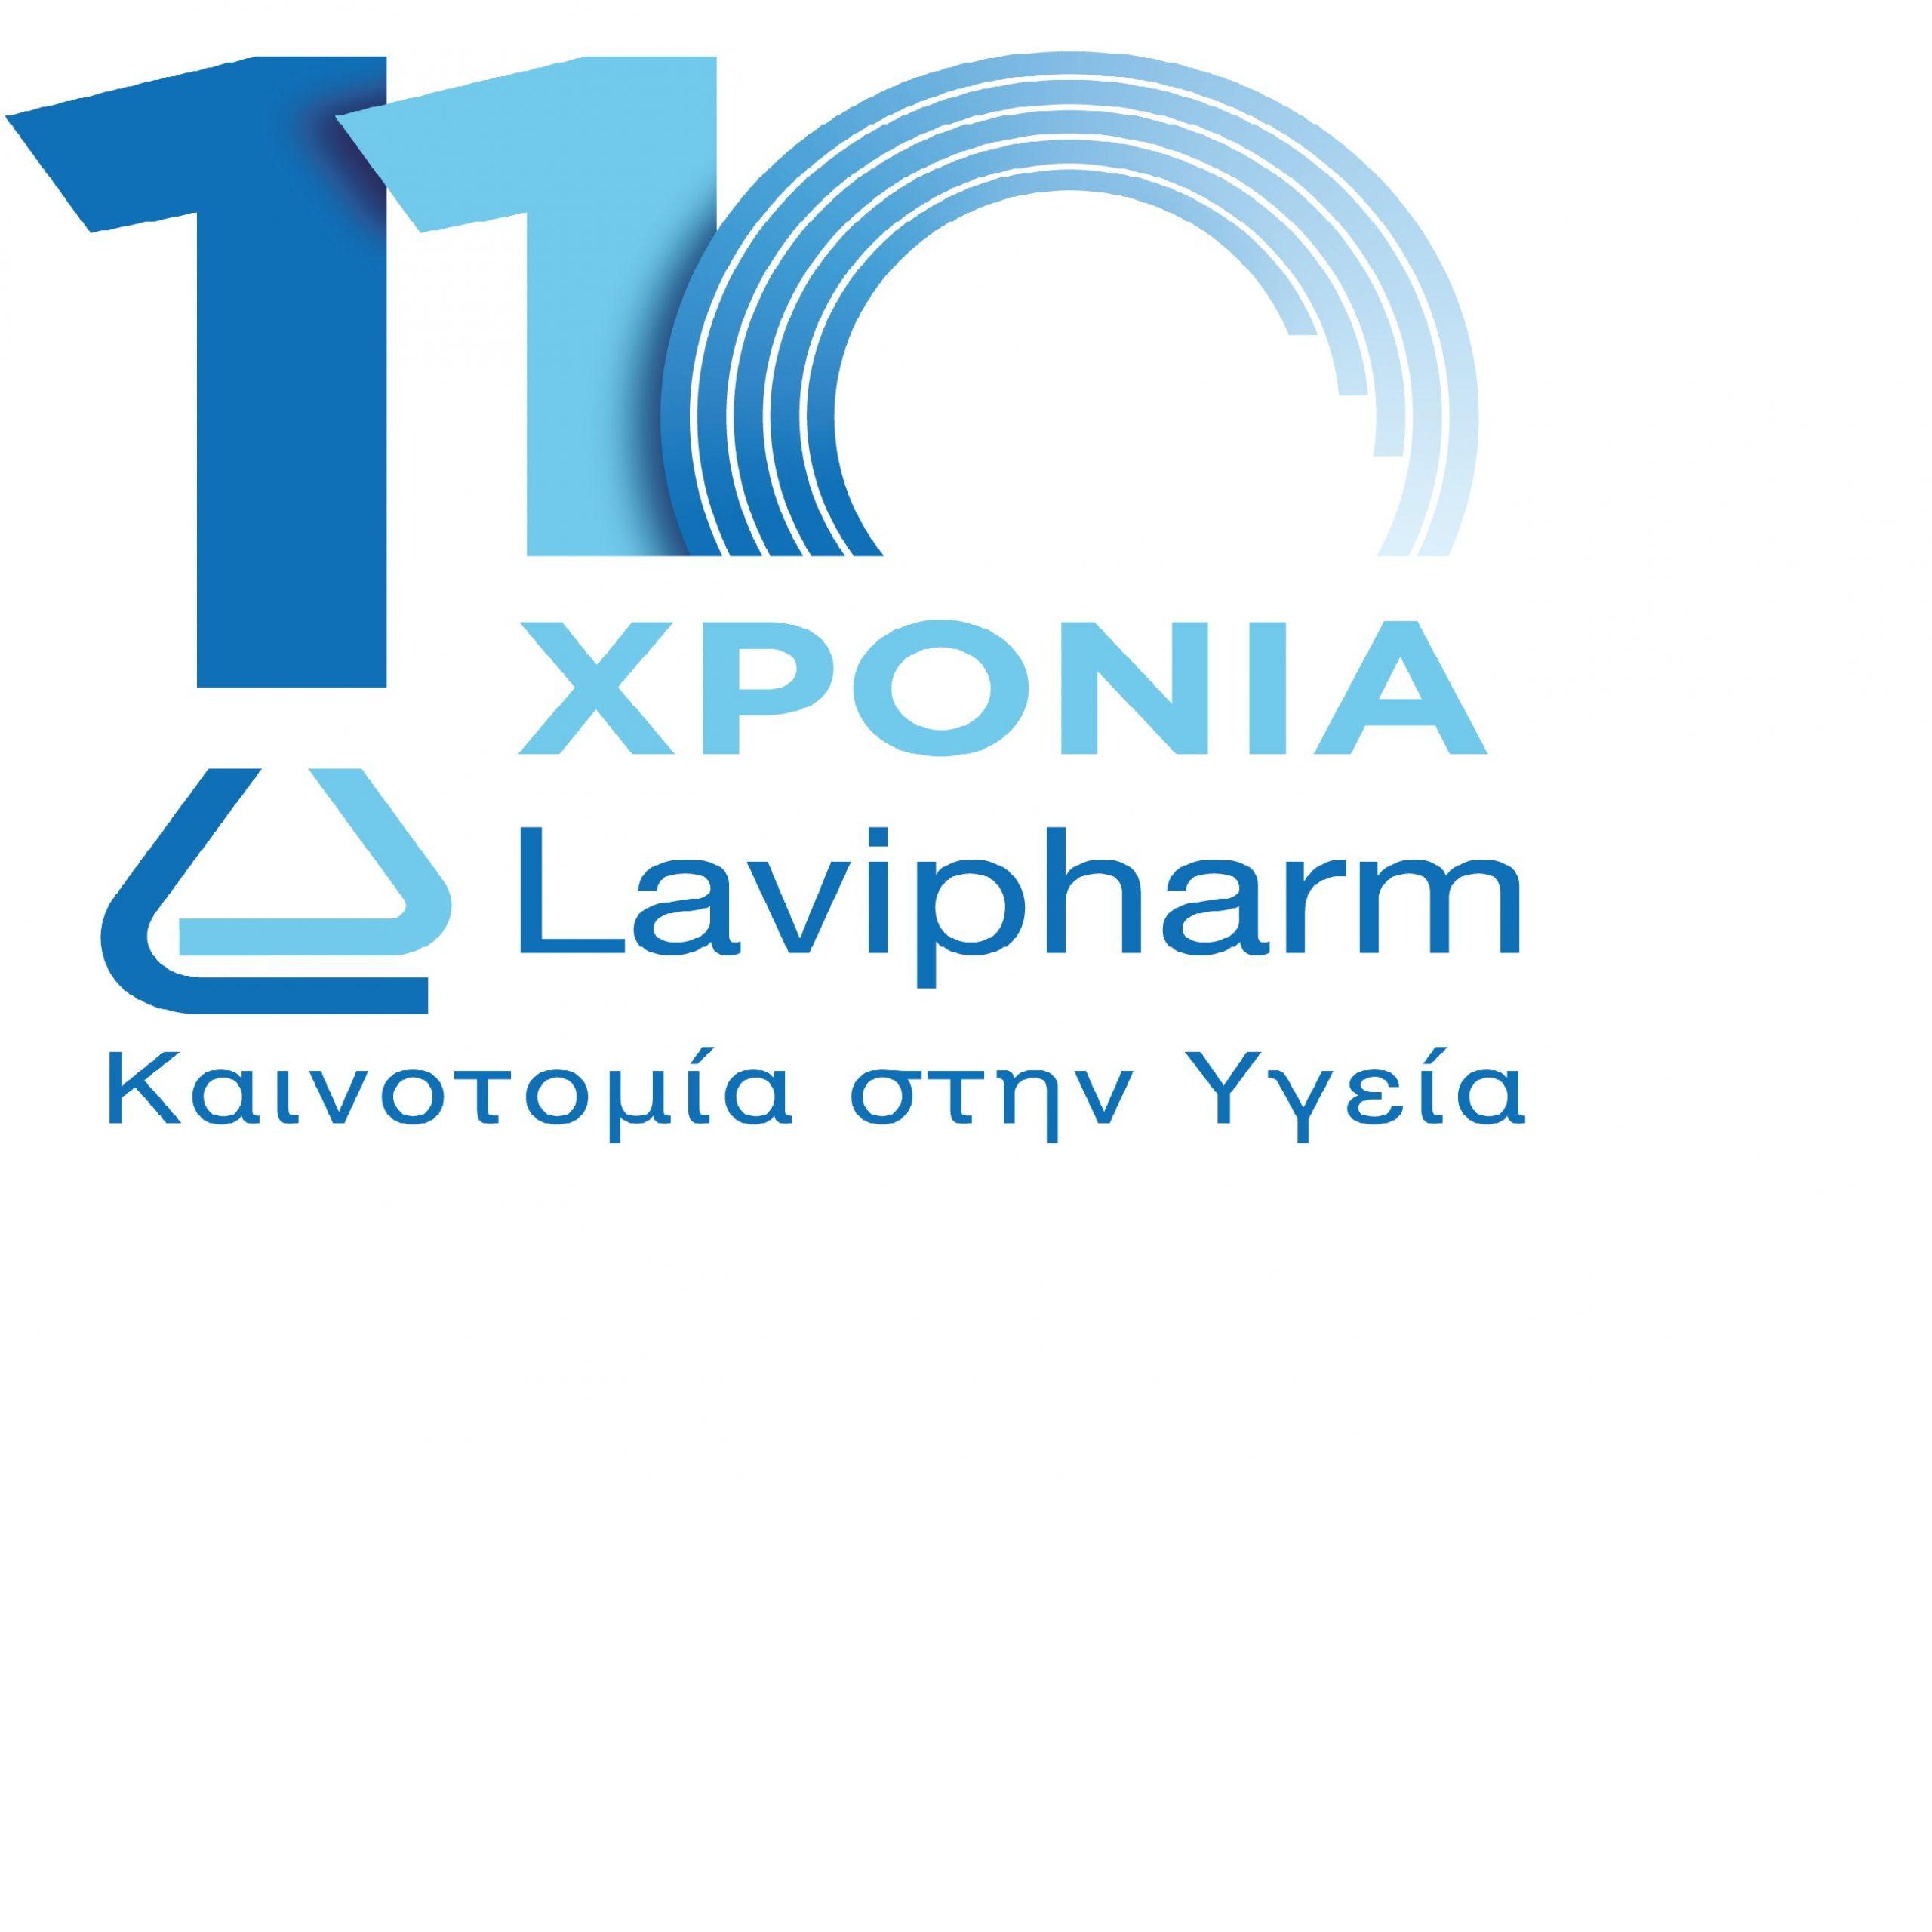 Lavipharm:Νέο φαρμακευτικό σκεύασμα για την Αρτηριακή Υπέρταση